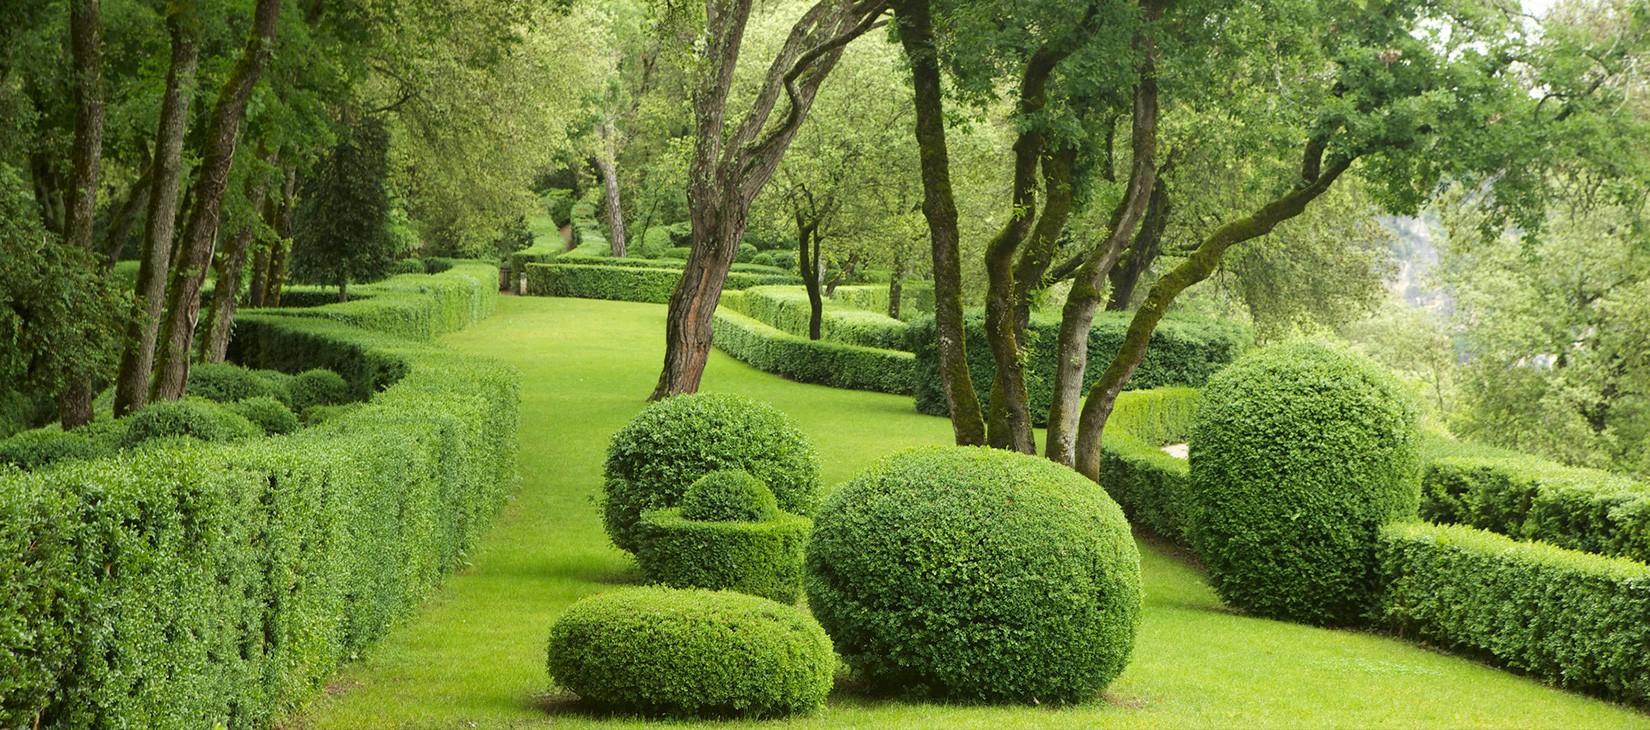 accueil jardin jardinerie dalhem li ge. Black Bedroom Furniture Sets. Home Design Ideas